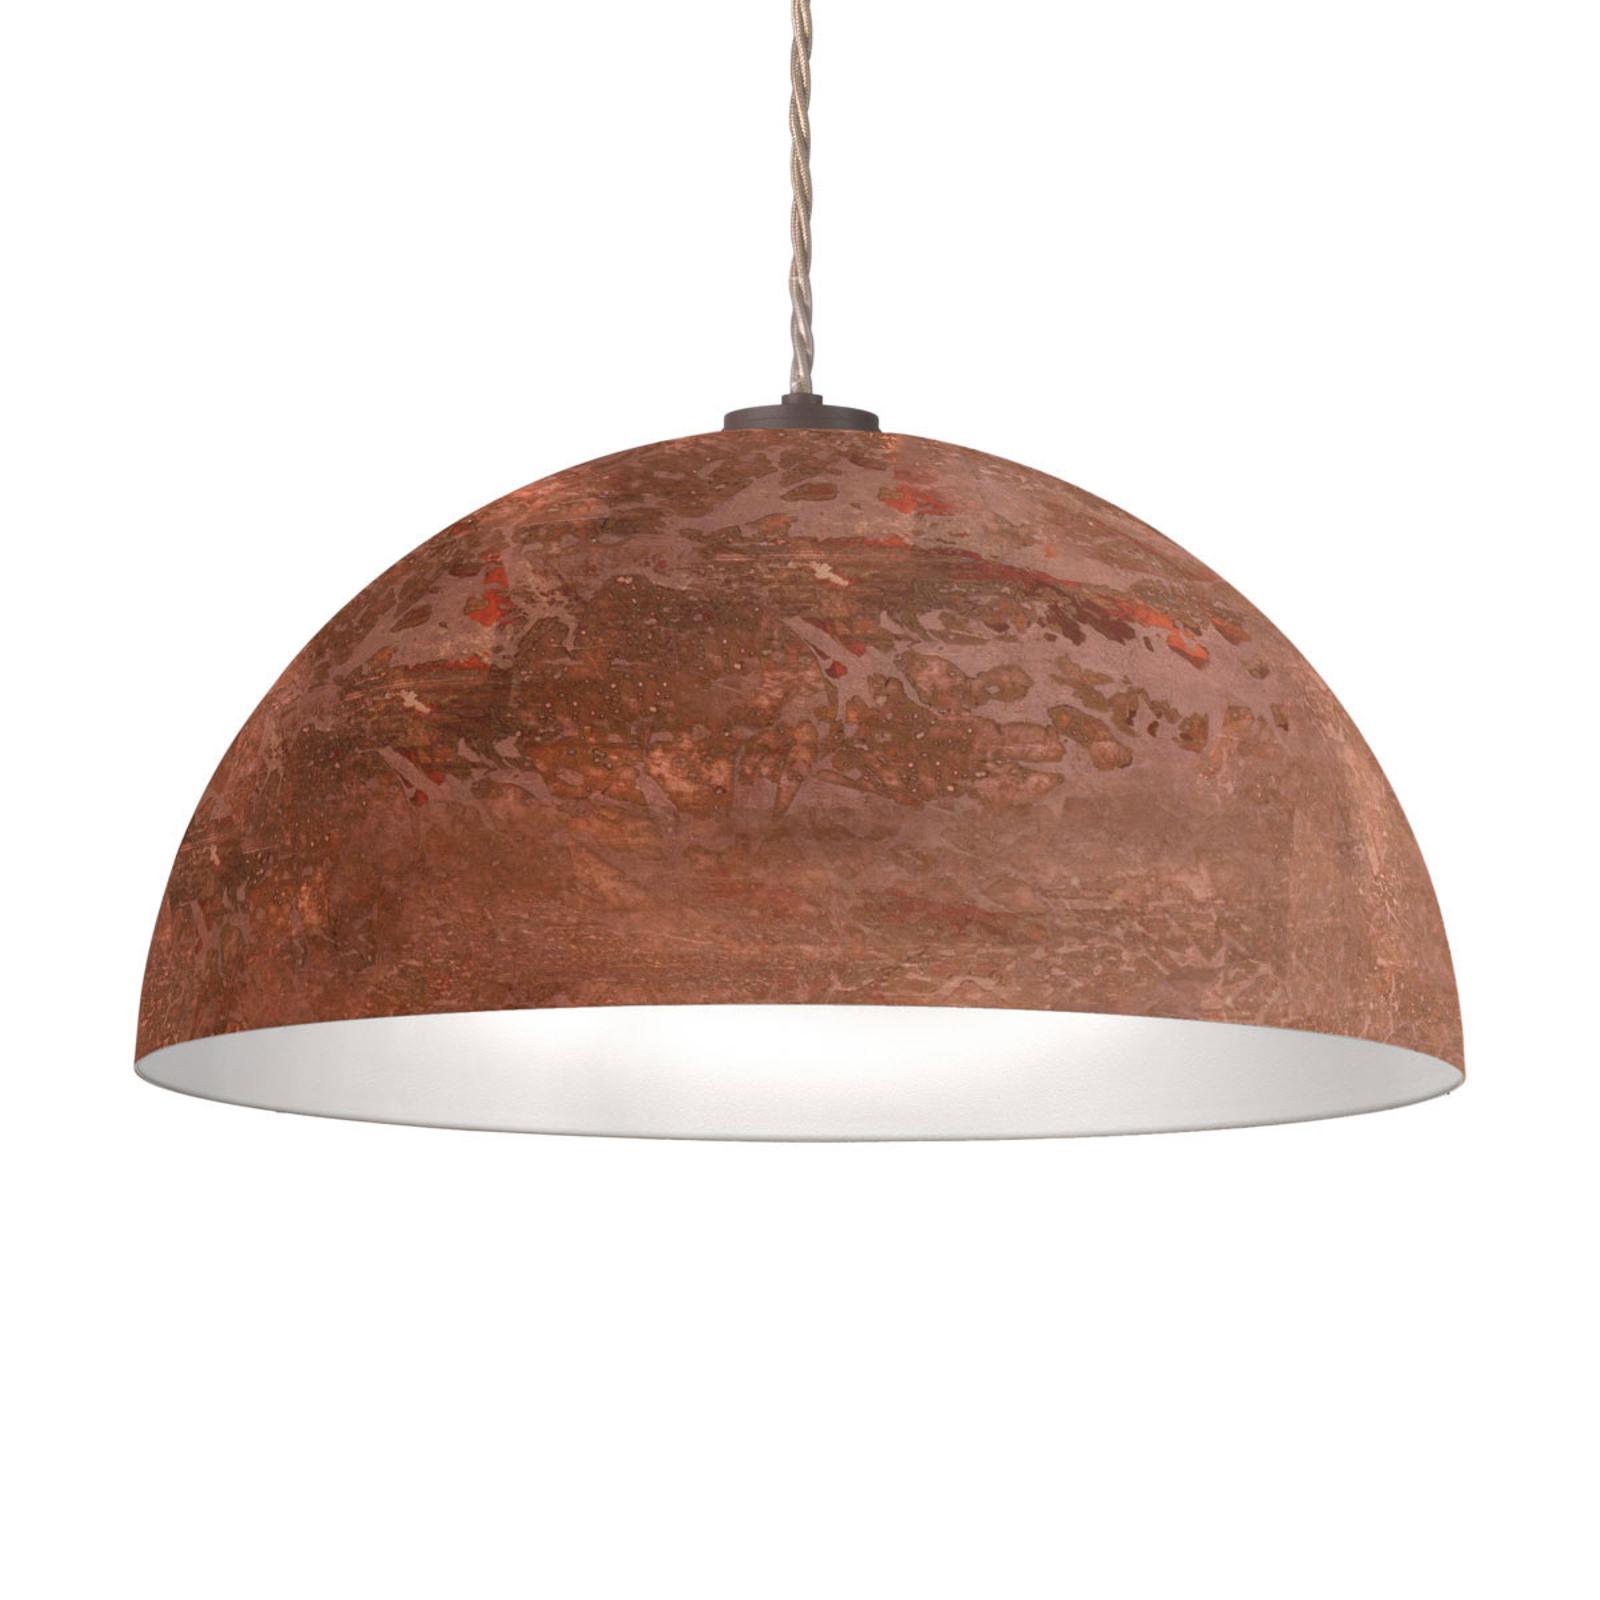 Lampa wisząca Cult Vintage, miedź, Ø 40 cm